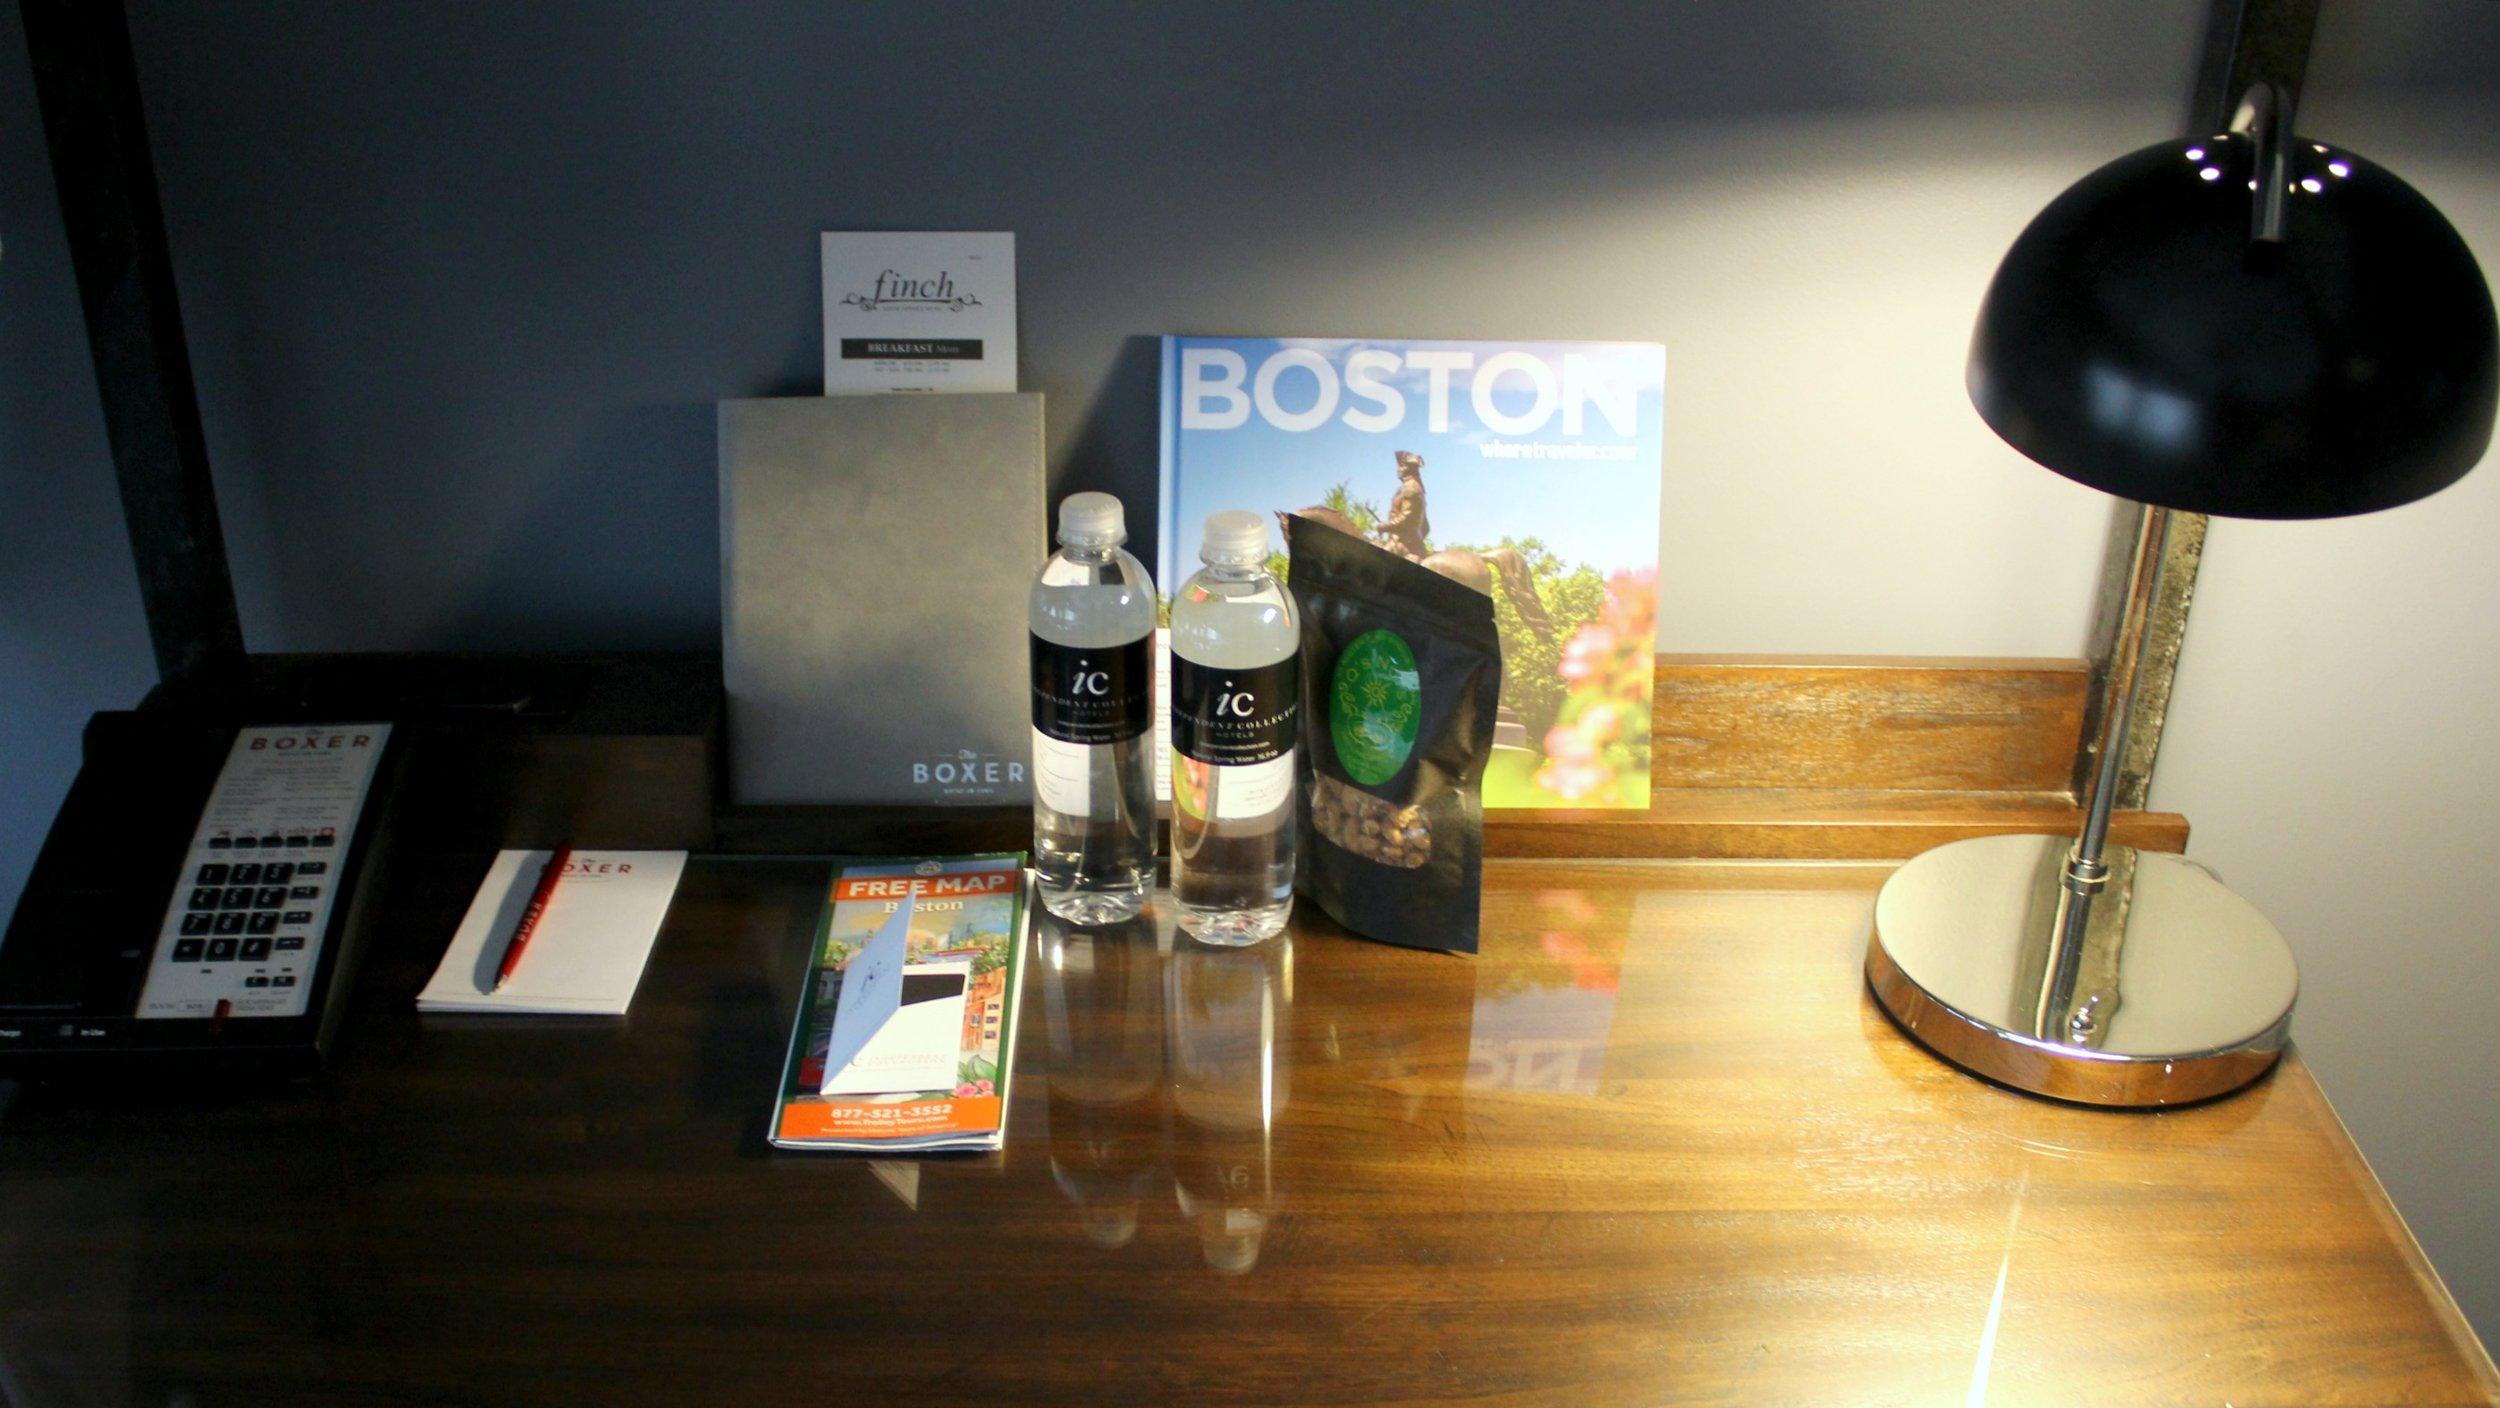 Boxer Boston 7.0.jpg